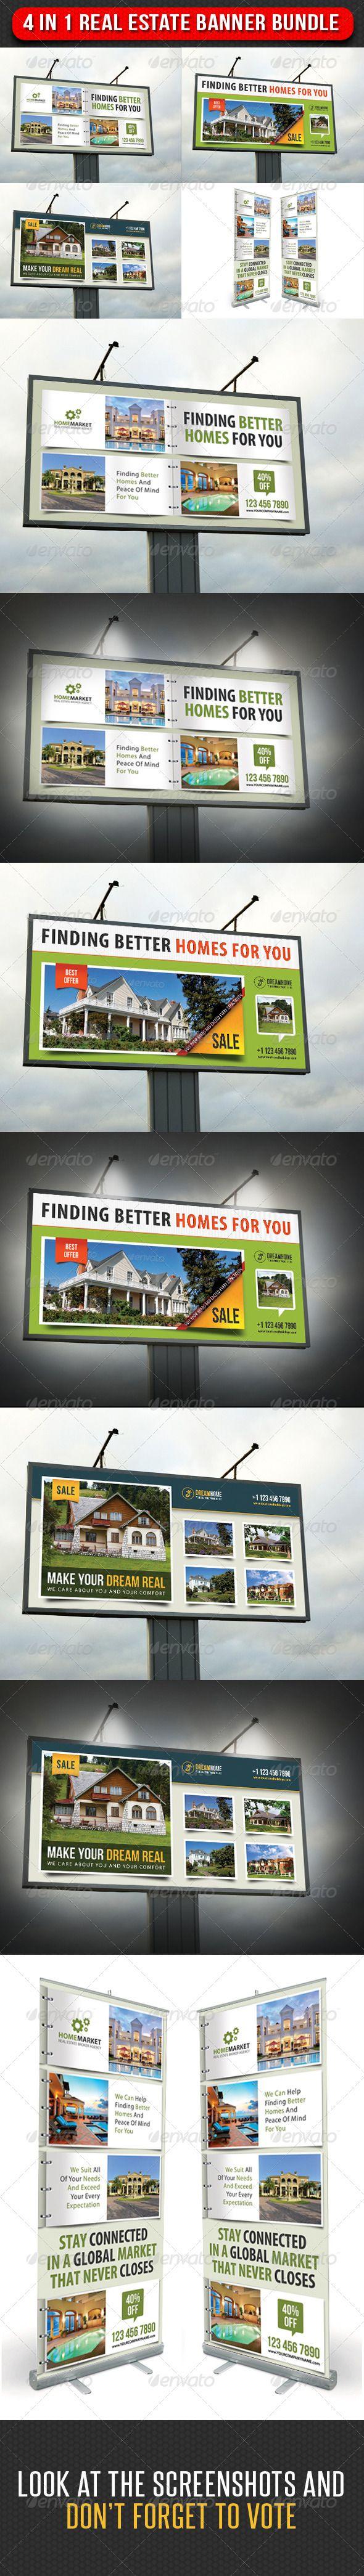 4 in 1 Real Estate Banner Bundle 03 — Photoshop PSD #outdoor banner #real esta…